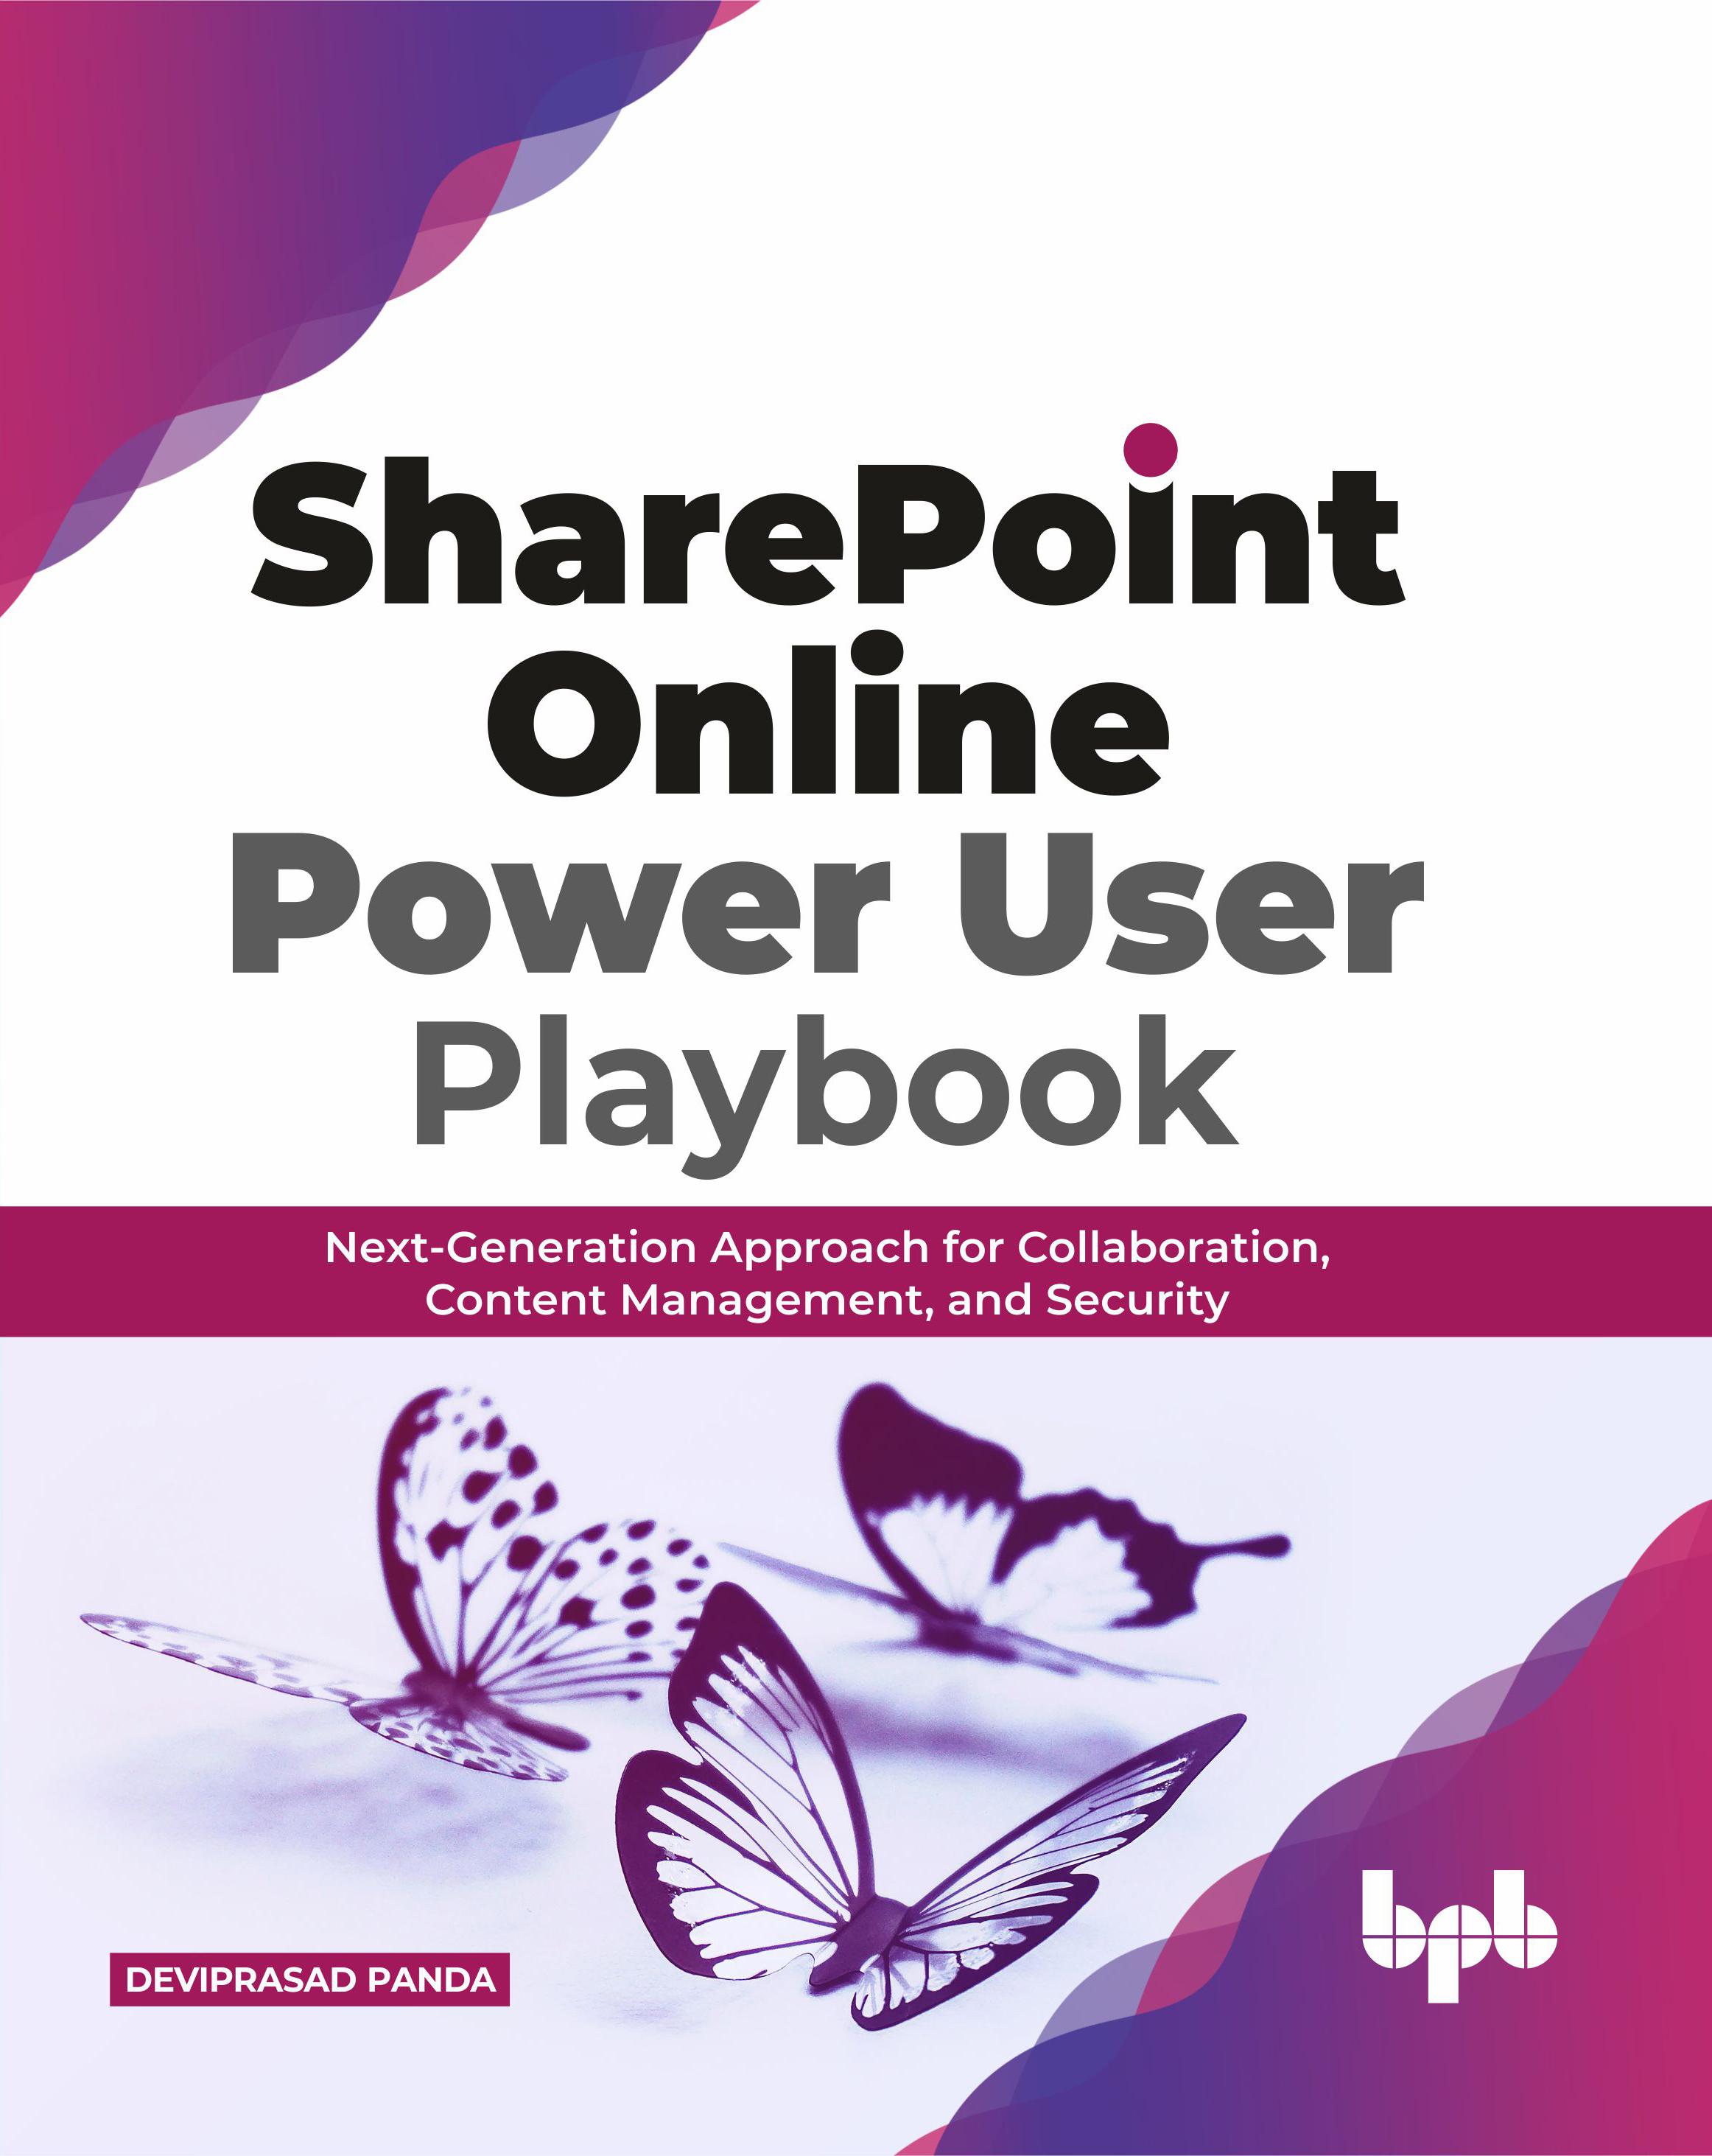 SharePoint online power user playbook